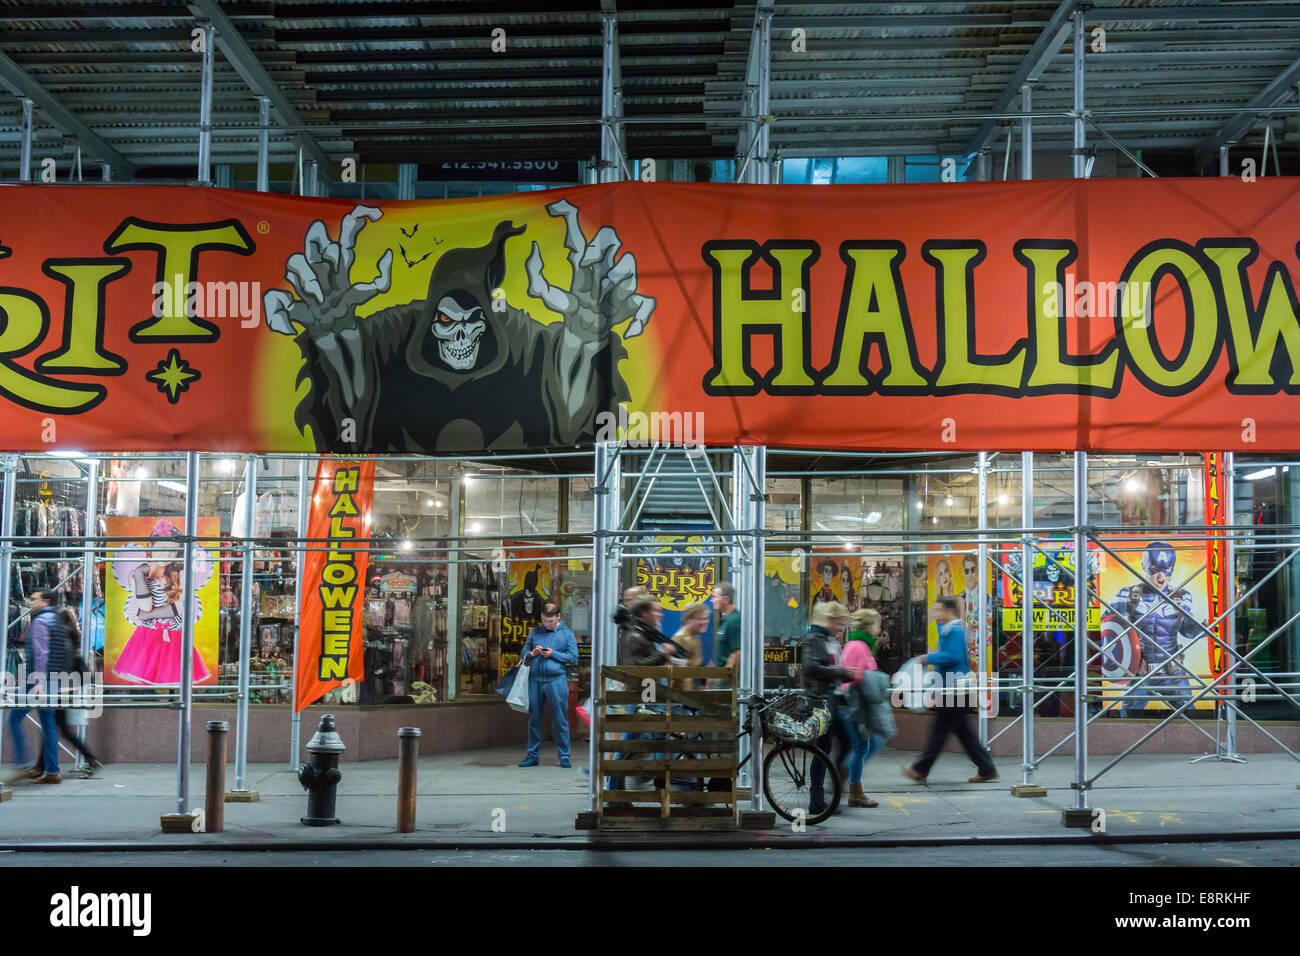 a spirit halloween pop-up store in midtown in new york stock photo